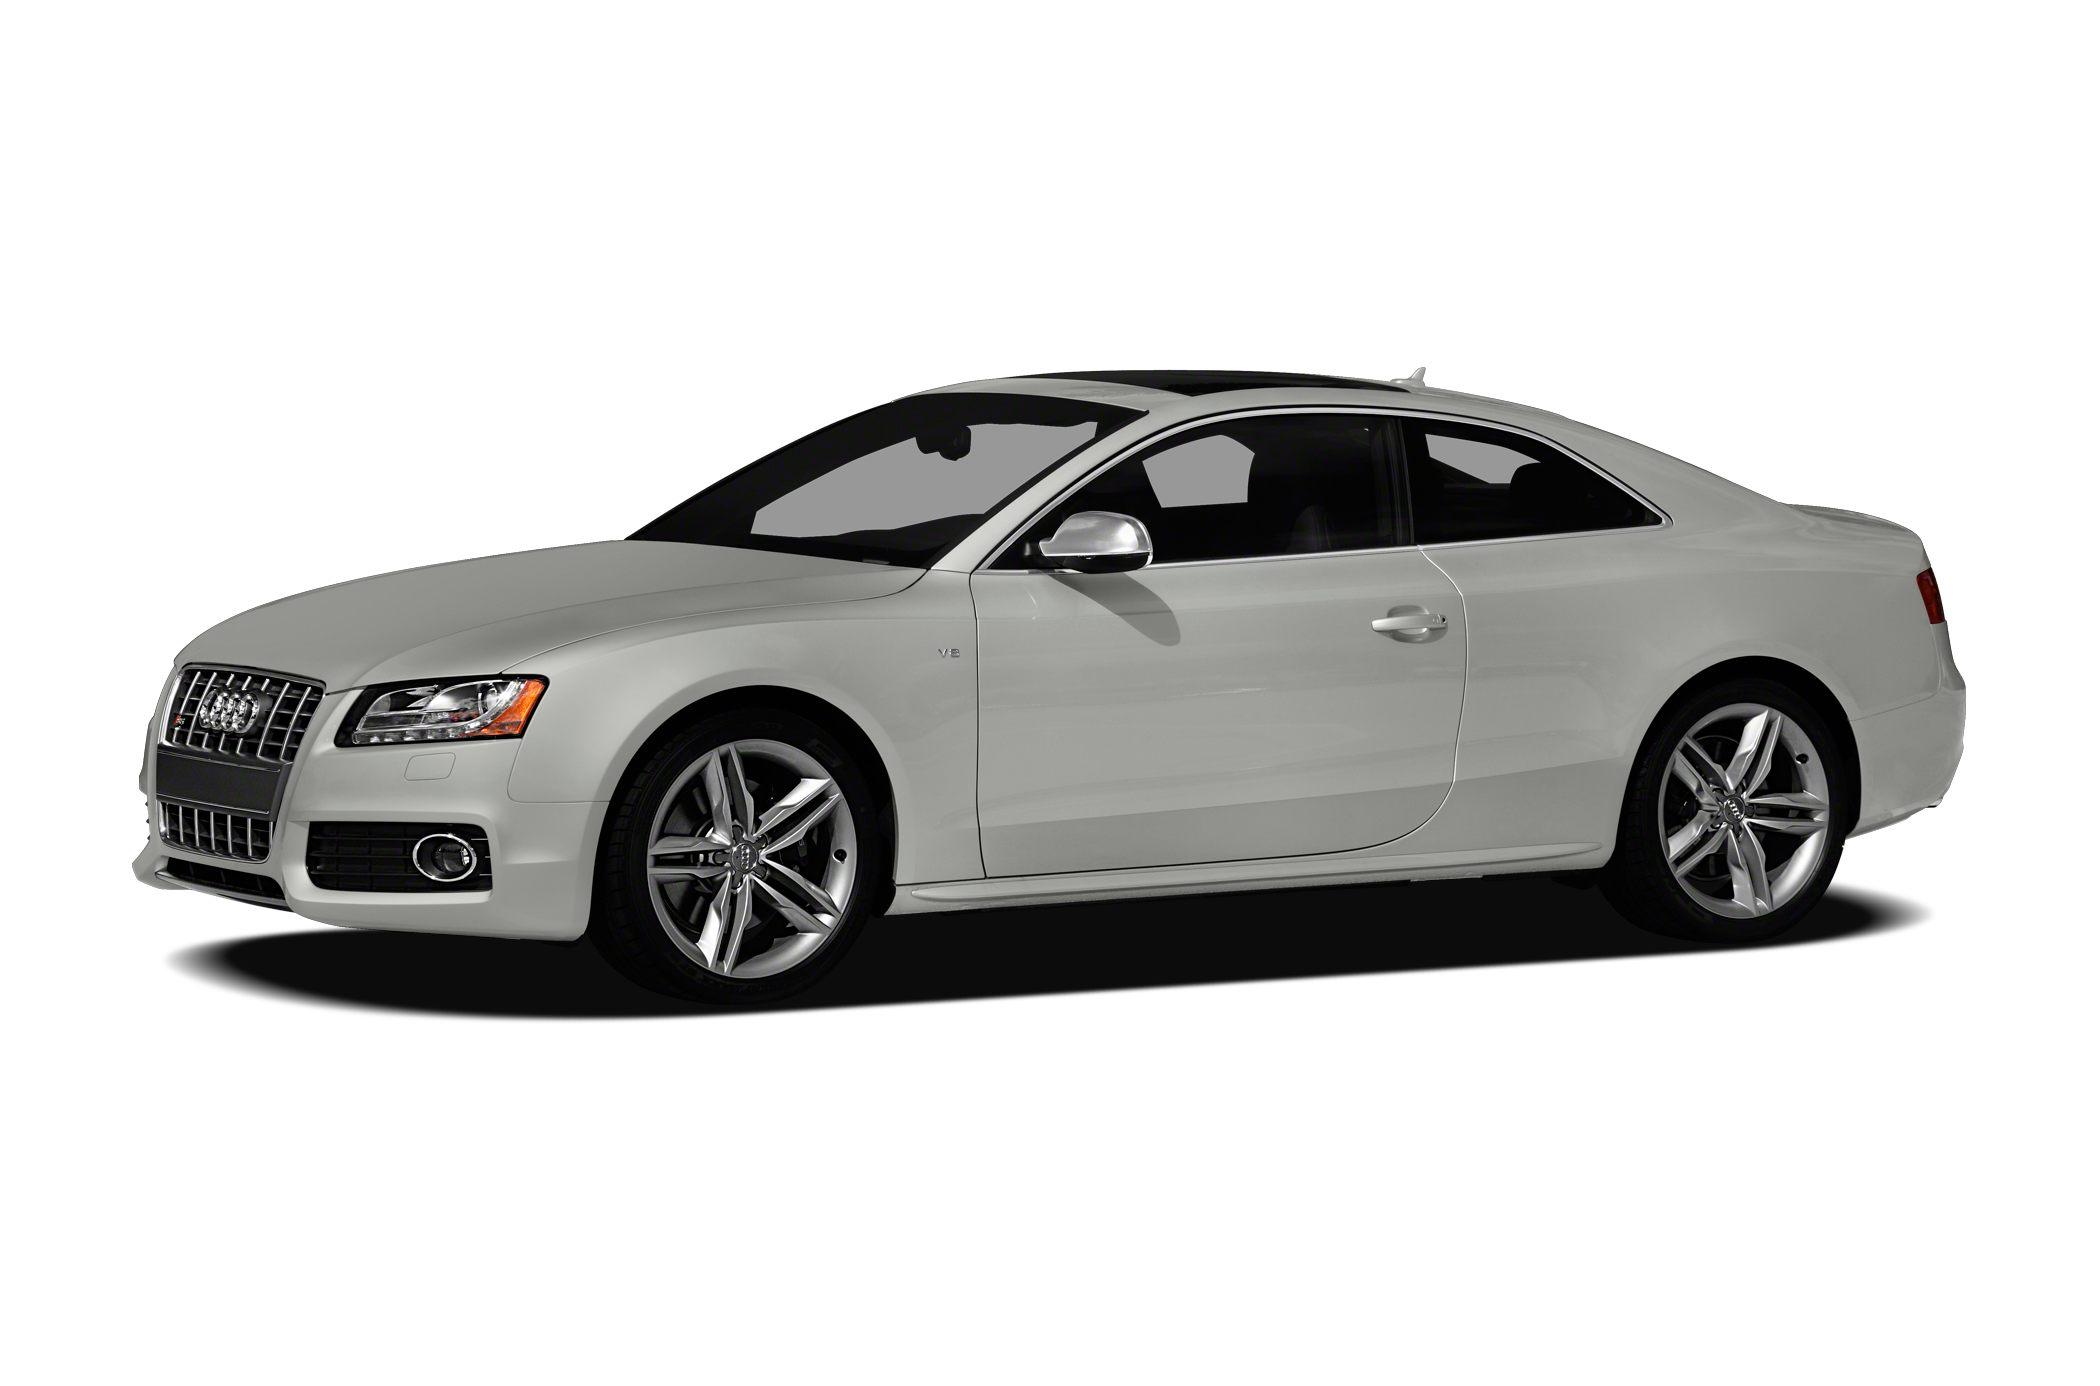 2010 Audi S5 Information